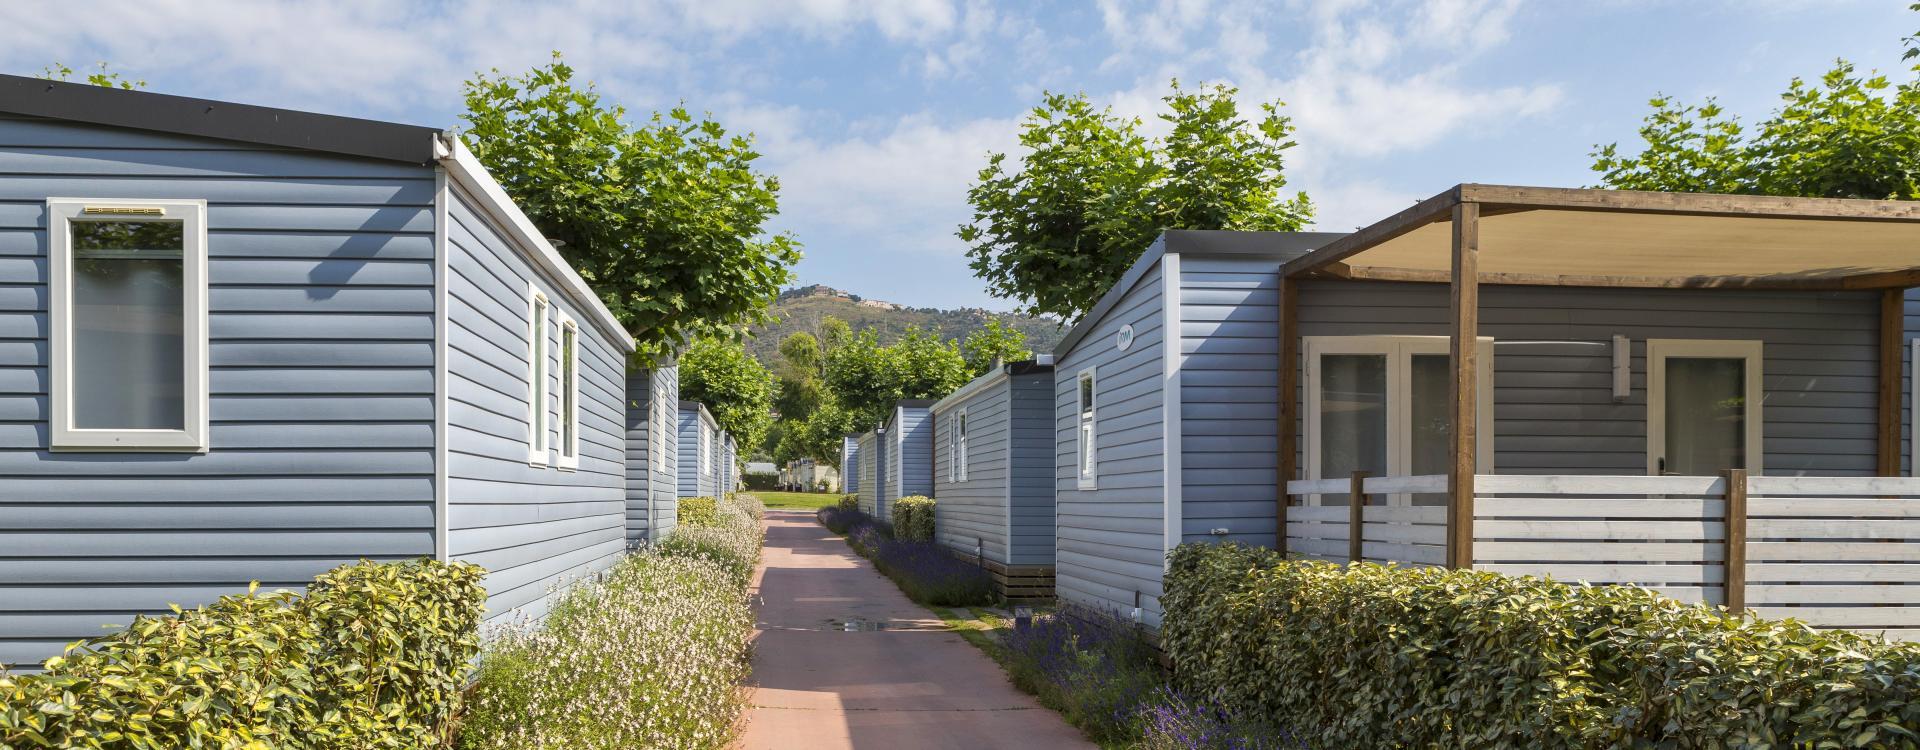 optimitzades/mobil-homes/emporda/camino-mobil-homes-camping-valldaro-playa-aro.jpg